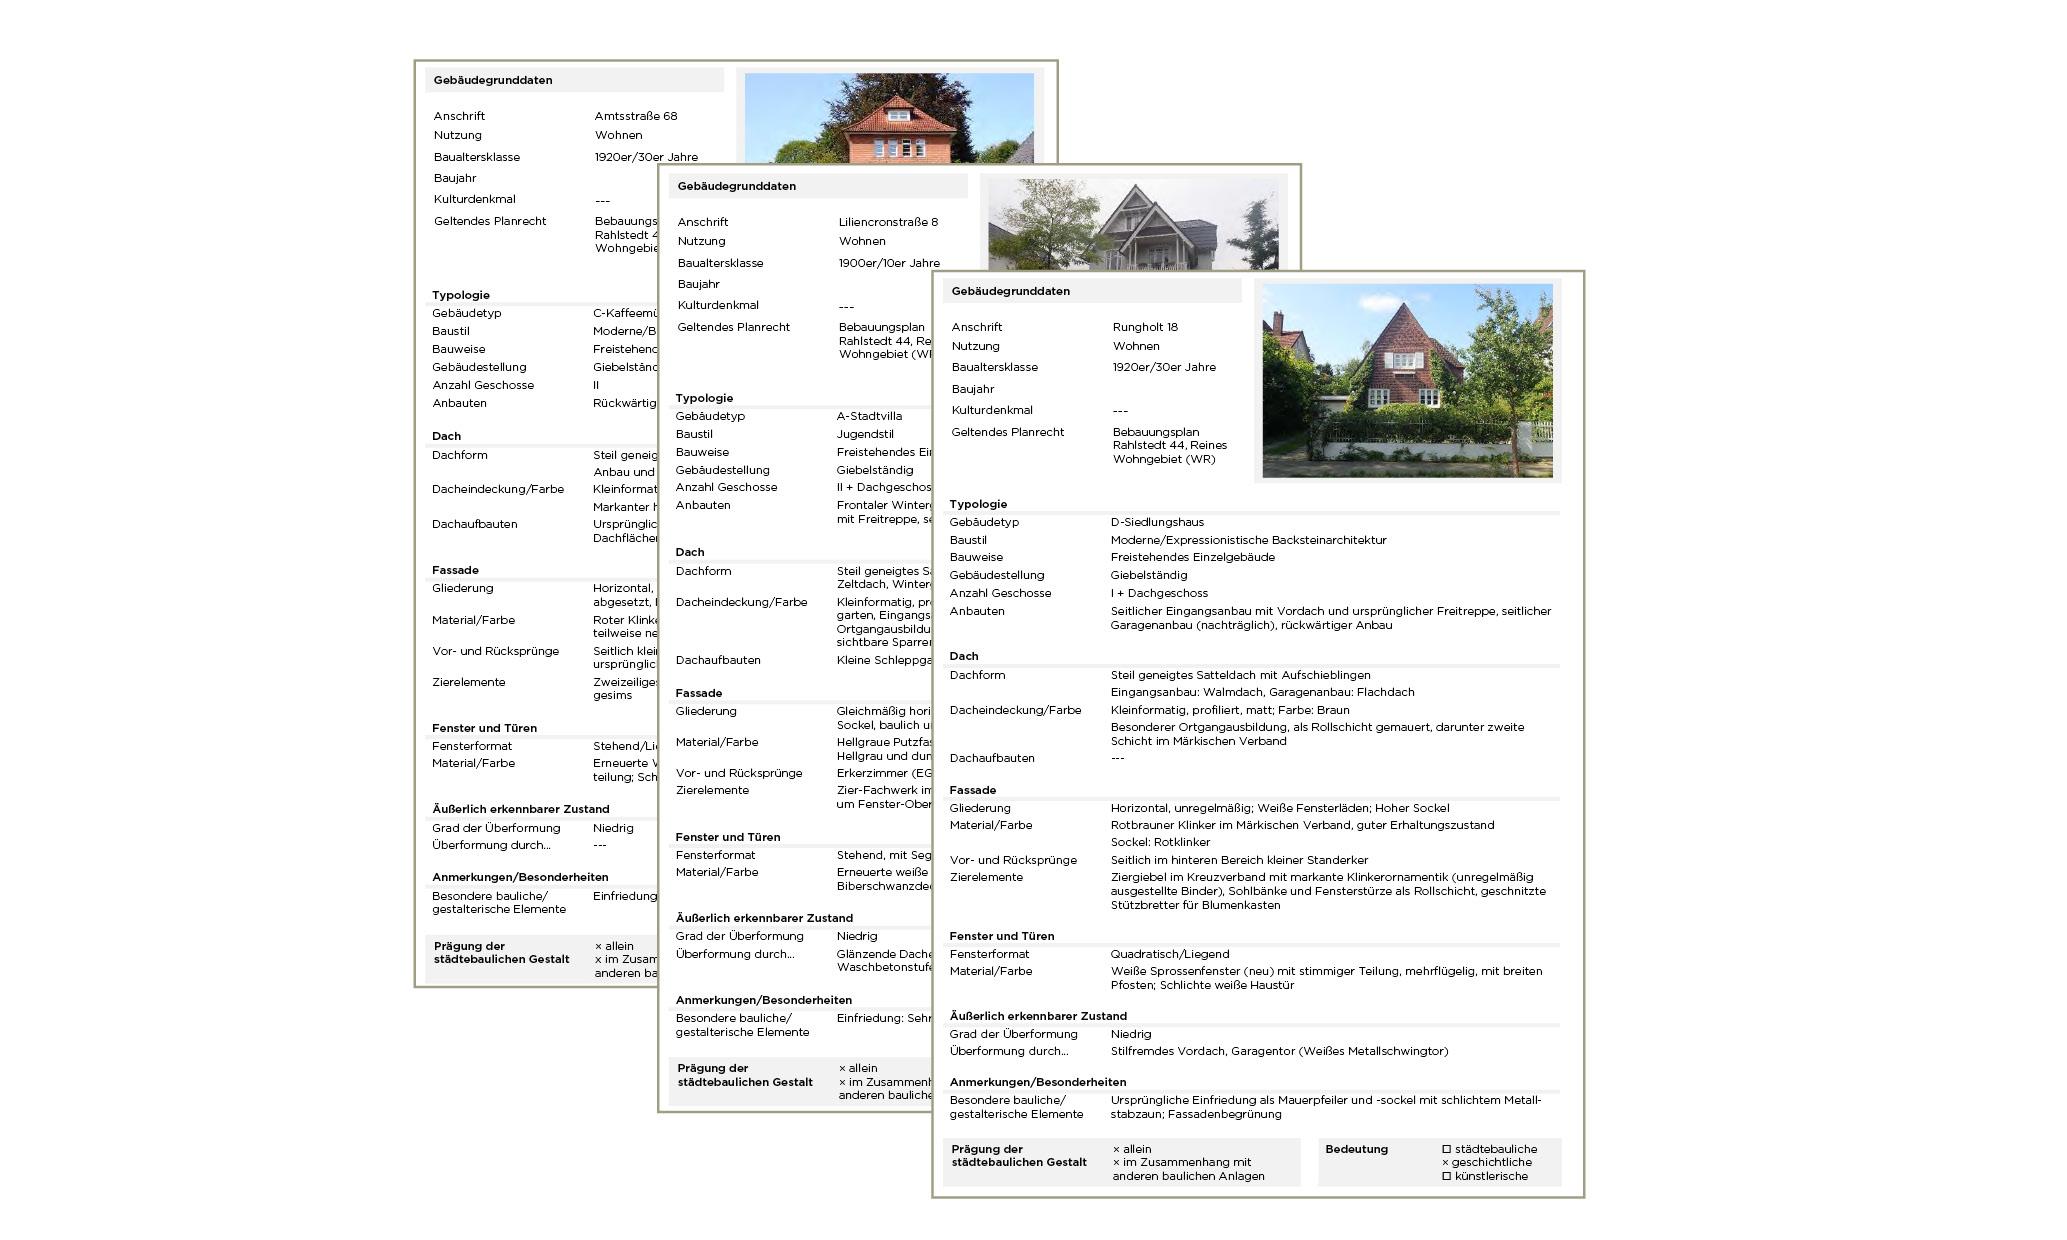 Rahlstedt Steckbriefe Gebäude Gestaltmerkmale Bedeutung Stadtbild